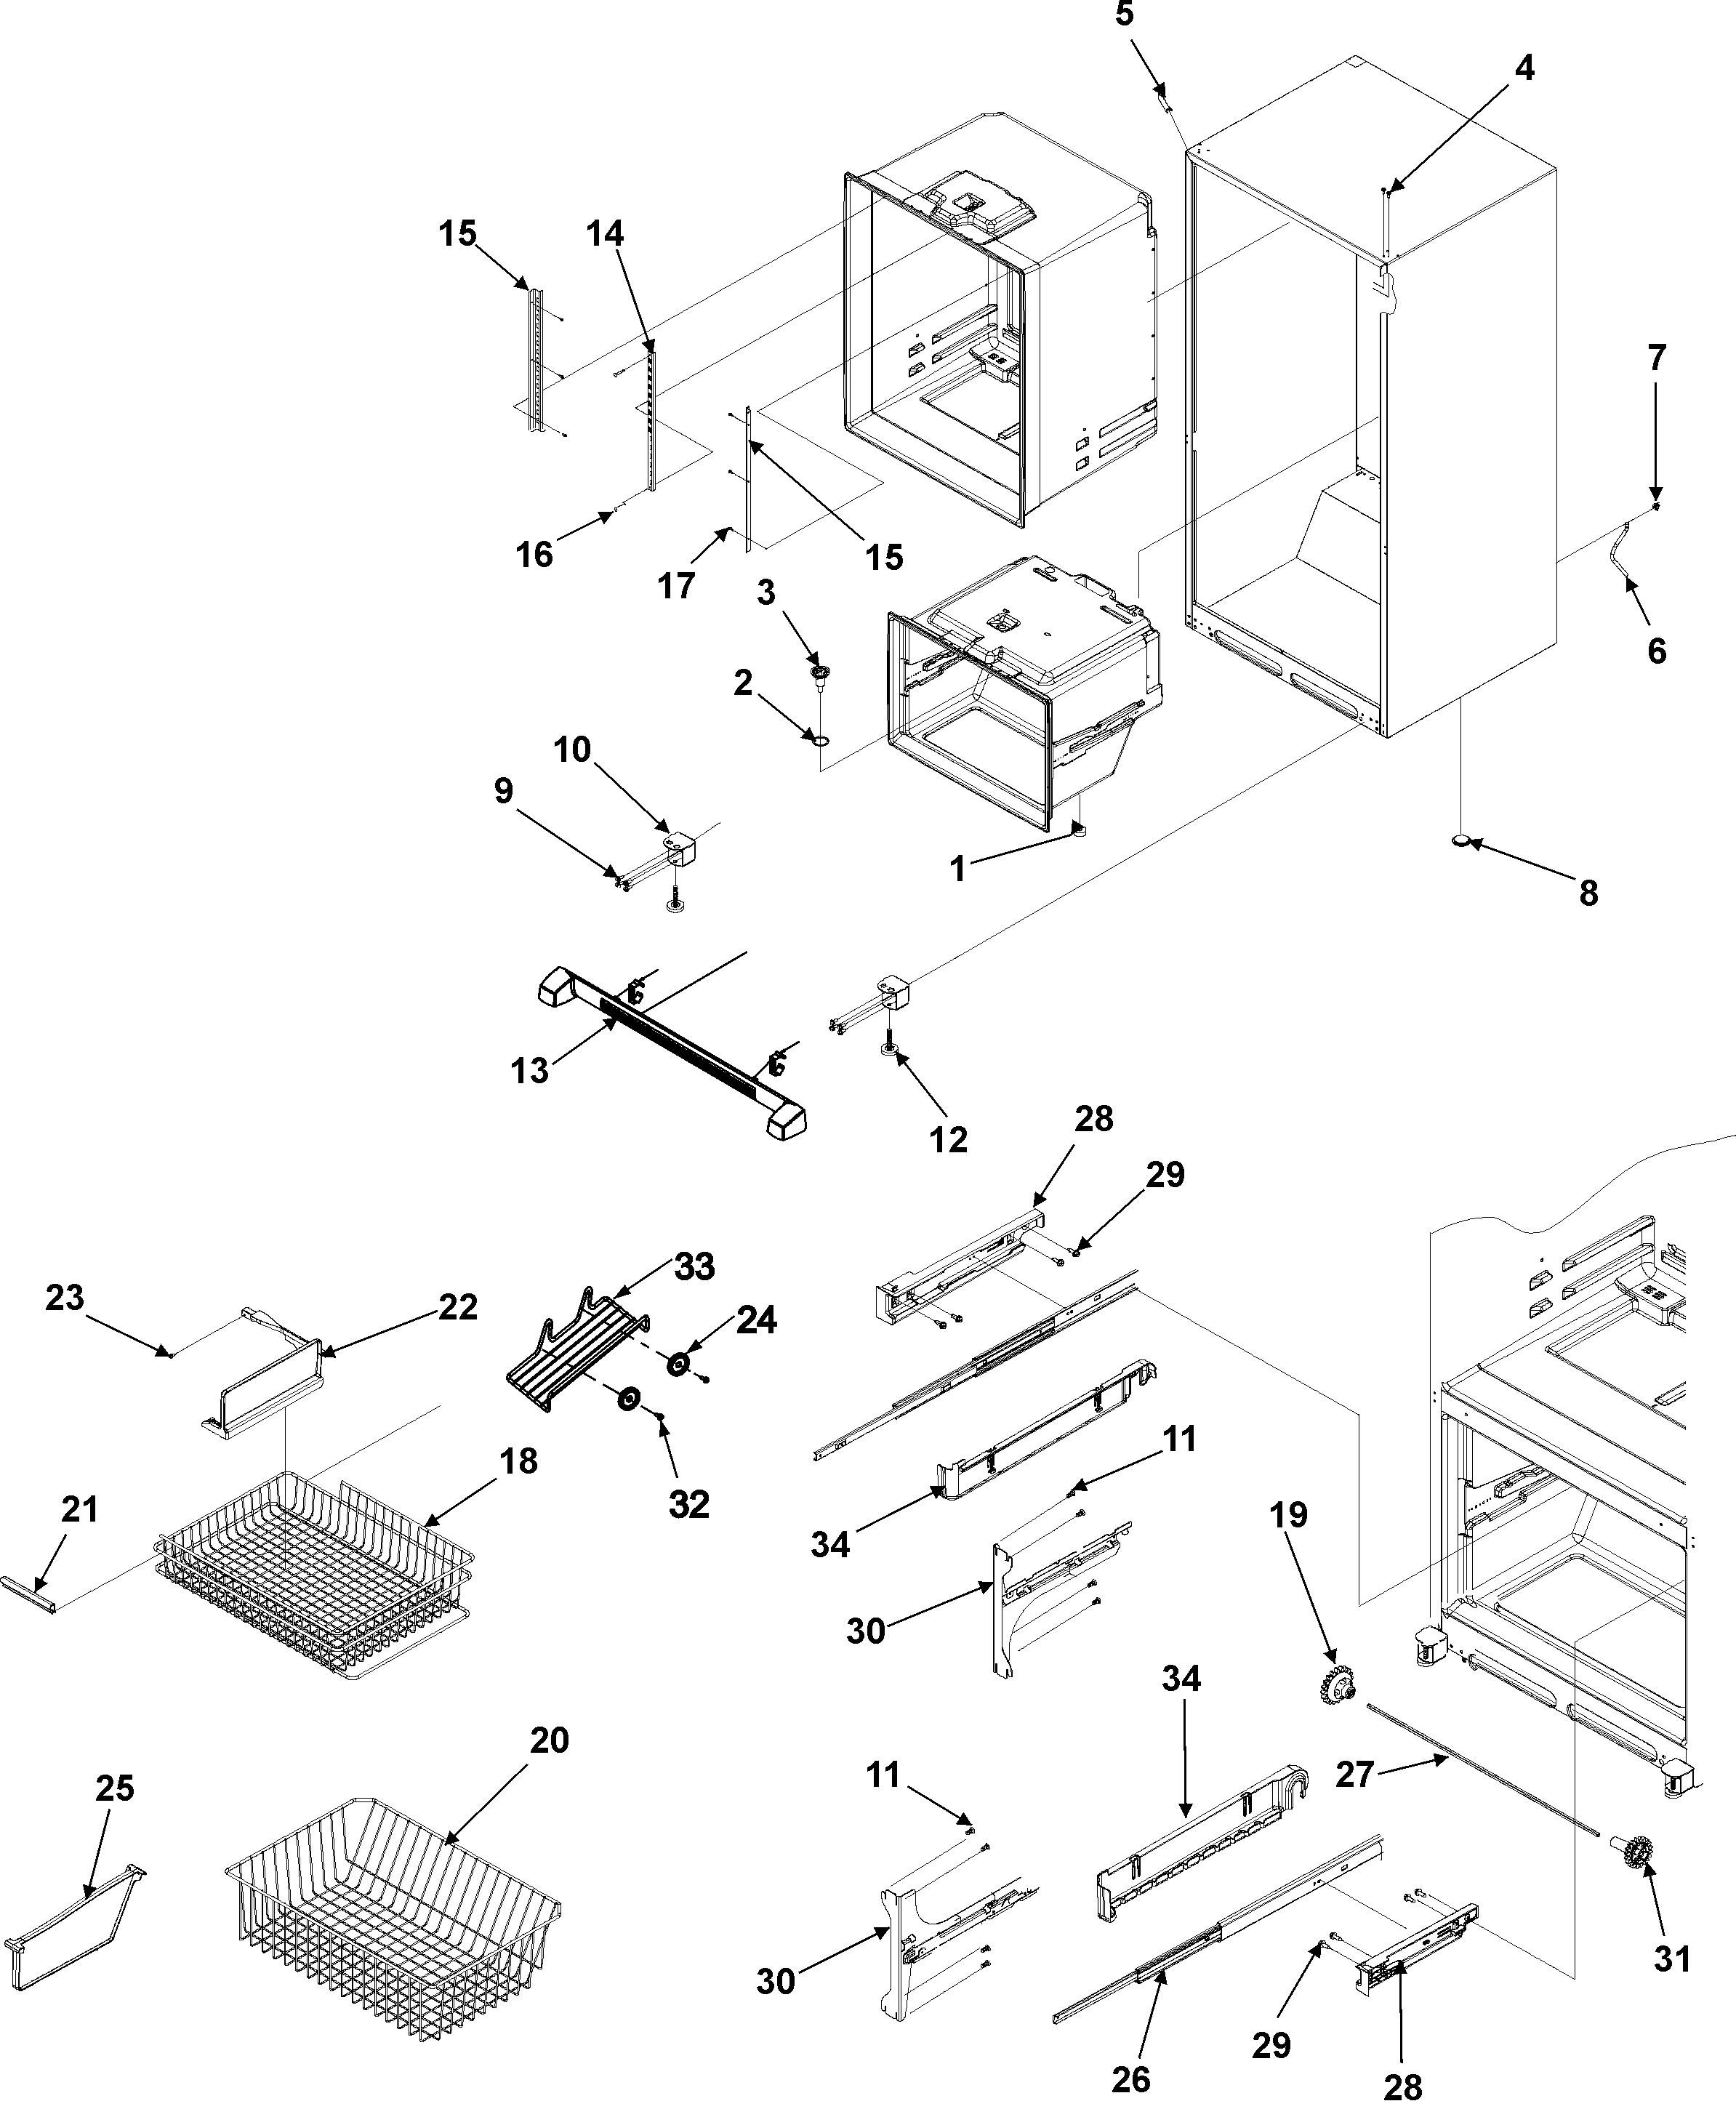 INTERIOR CABINET & FREEZER SHELVING Diagram & Parts List